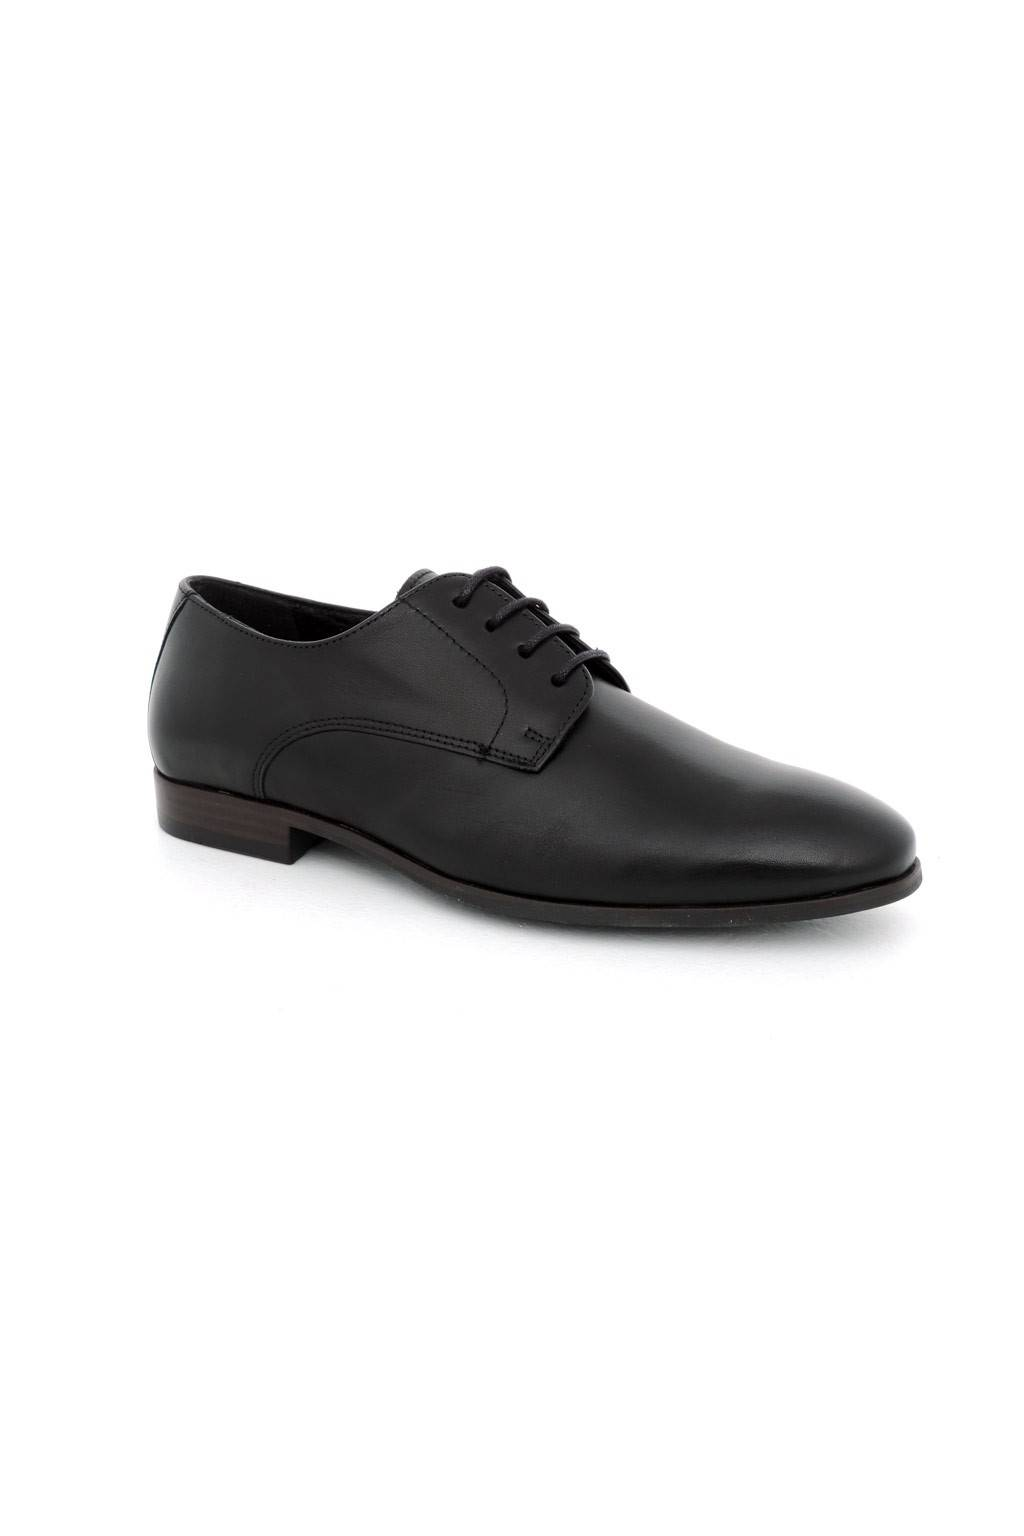 520490da9bf Men shoes Tolino A8085 Black - medinapiel.es